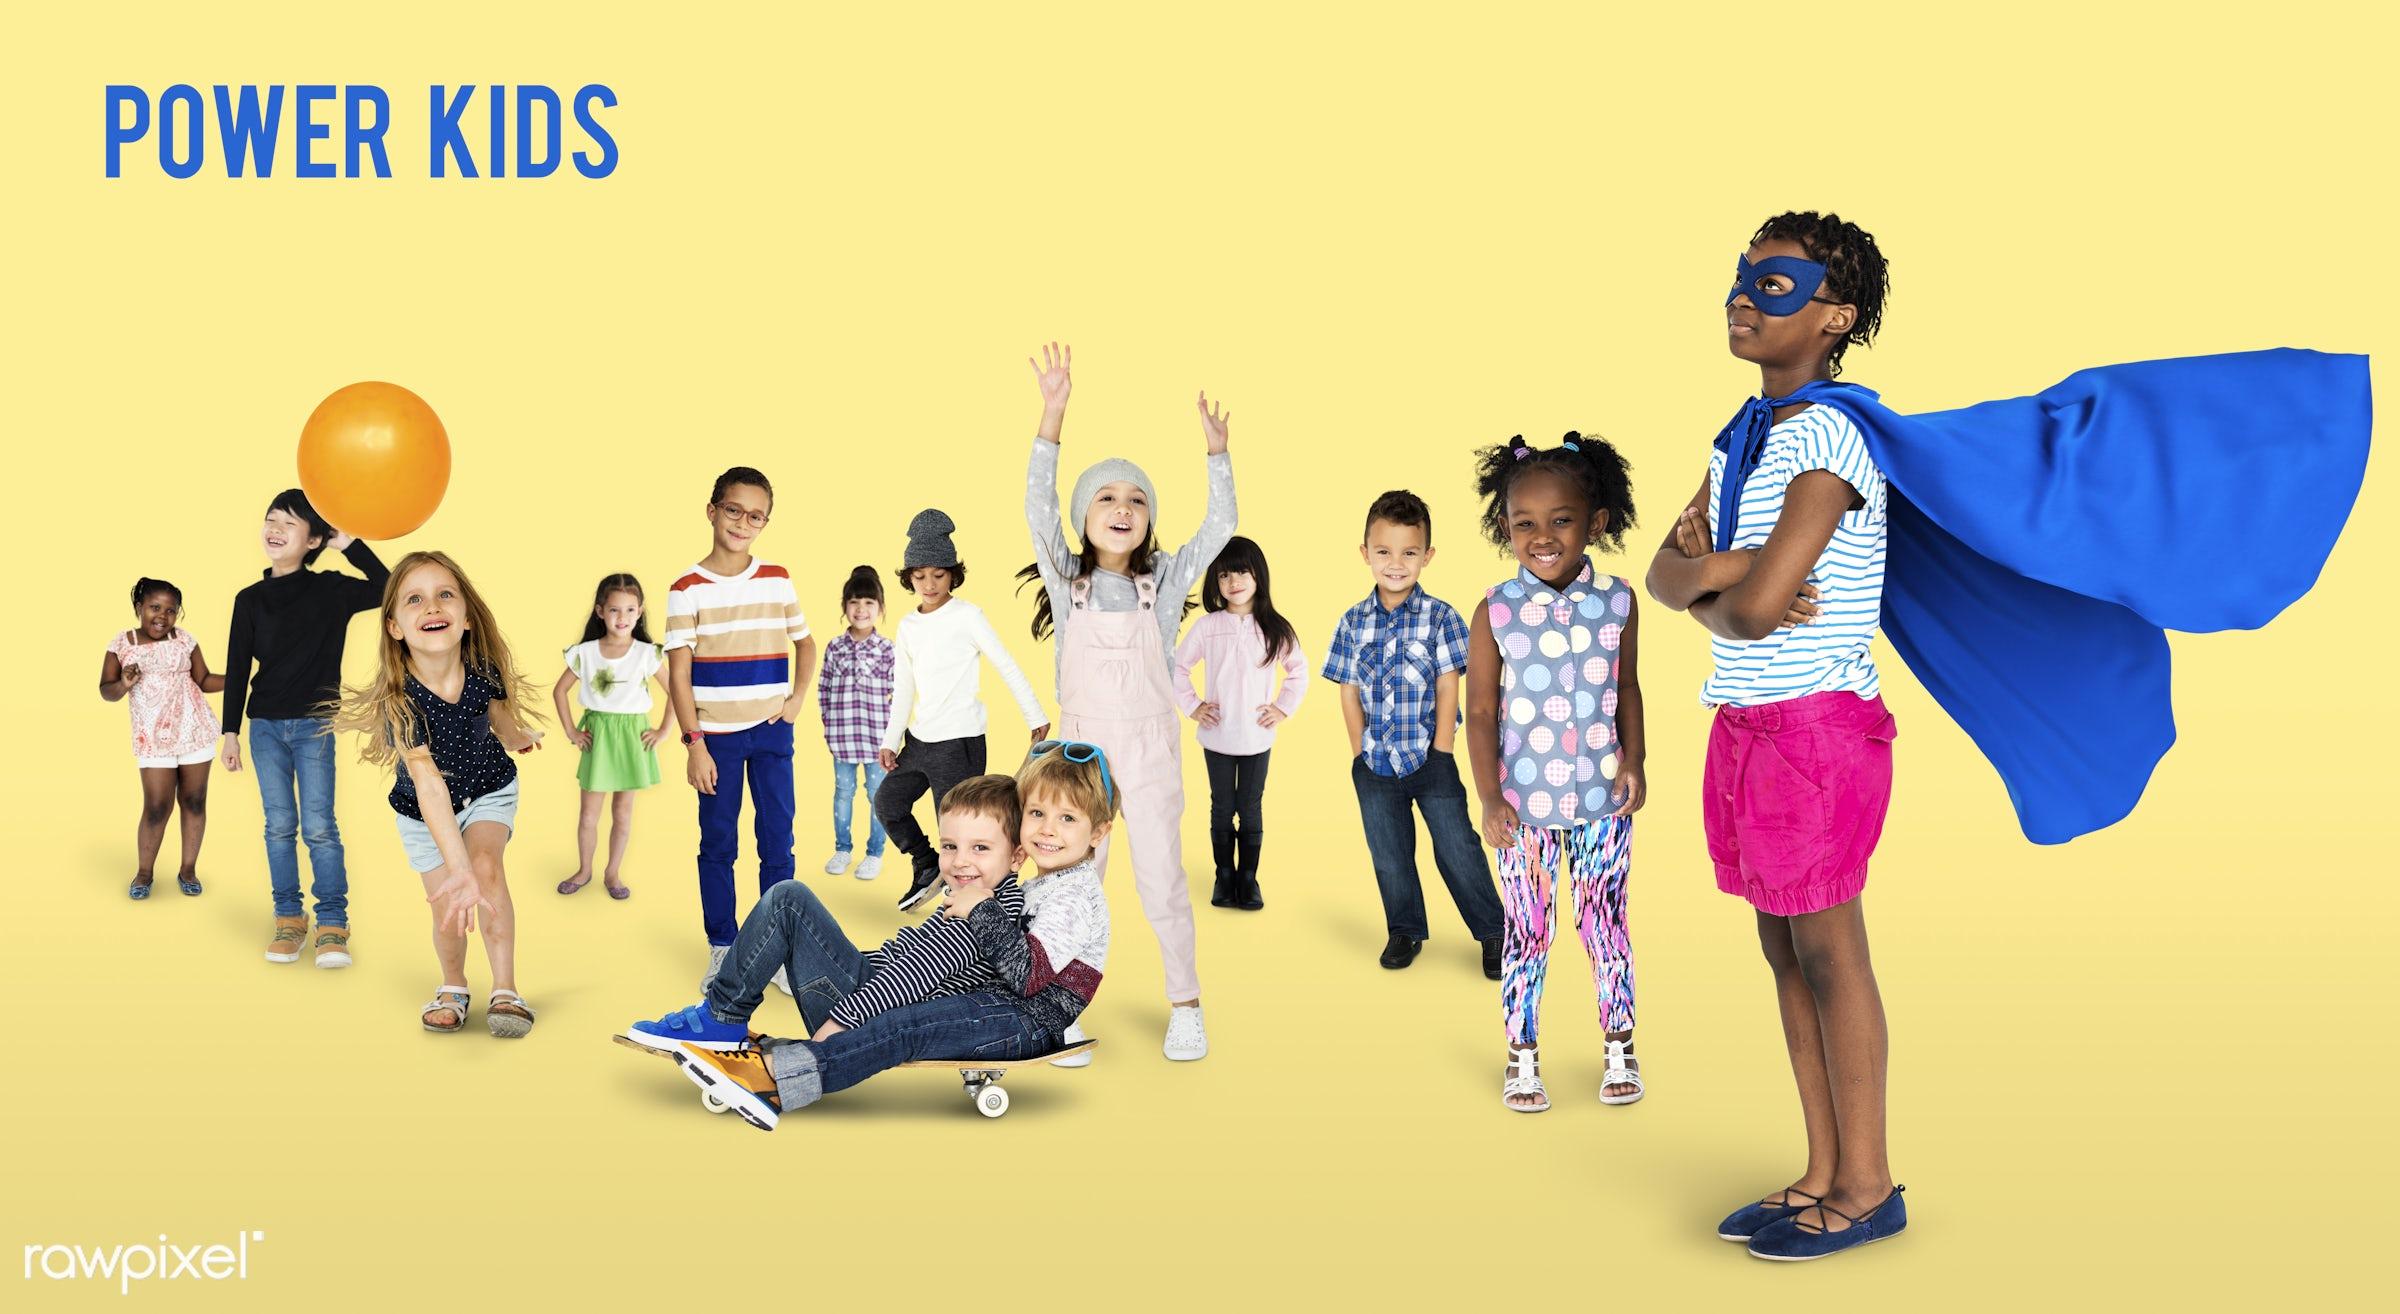 studio, person, diverse, innocent, little, entertain, recreation, people, caucasian, asian, little girls, lifestyle, power,...